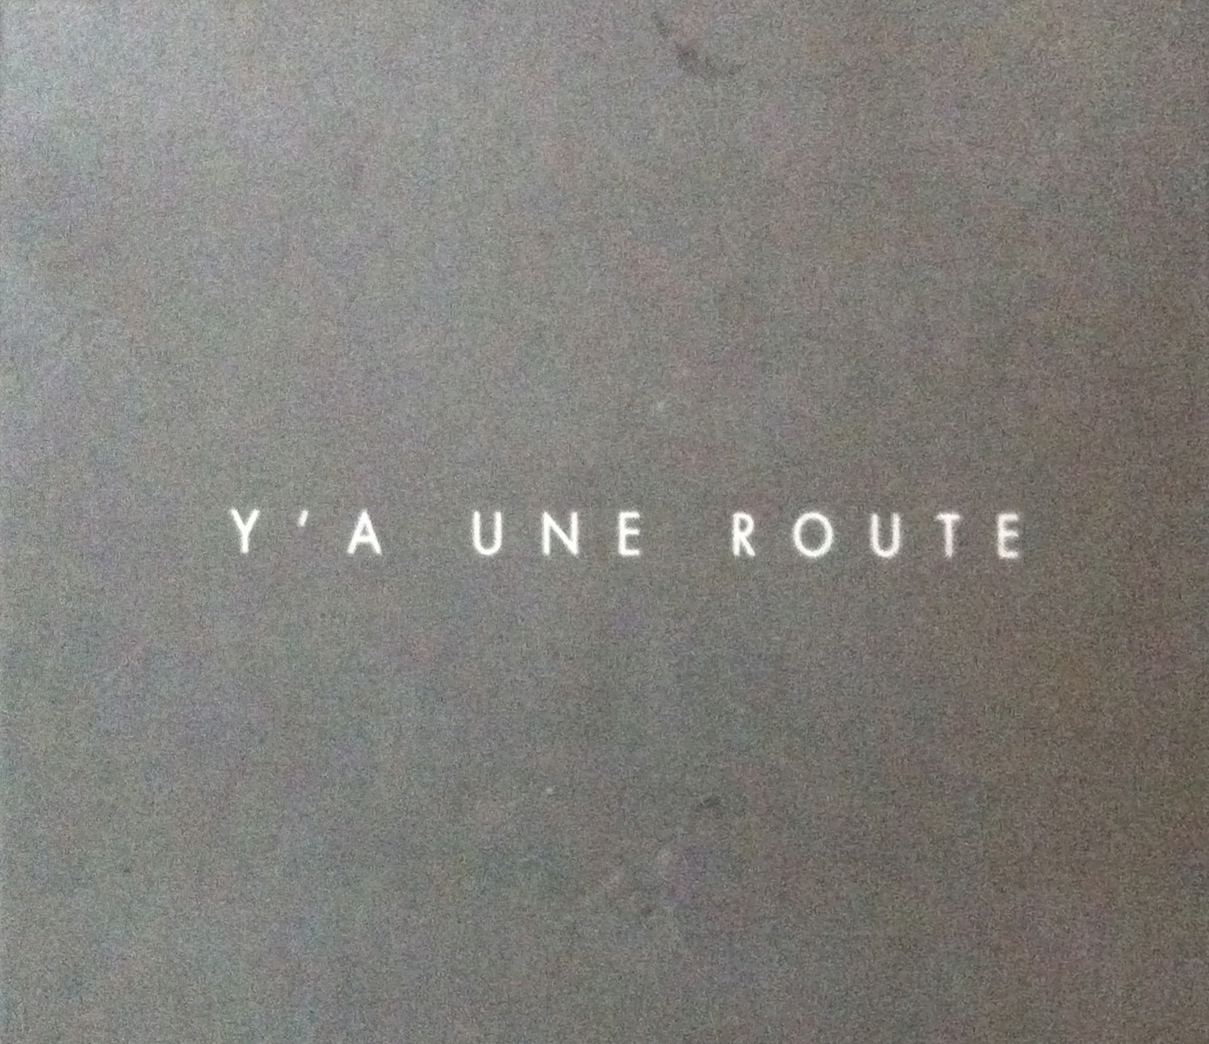 Chanson française-Playlist - Page 7 Img_4811